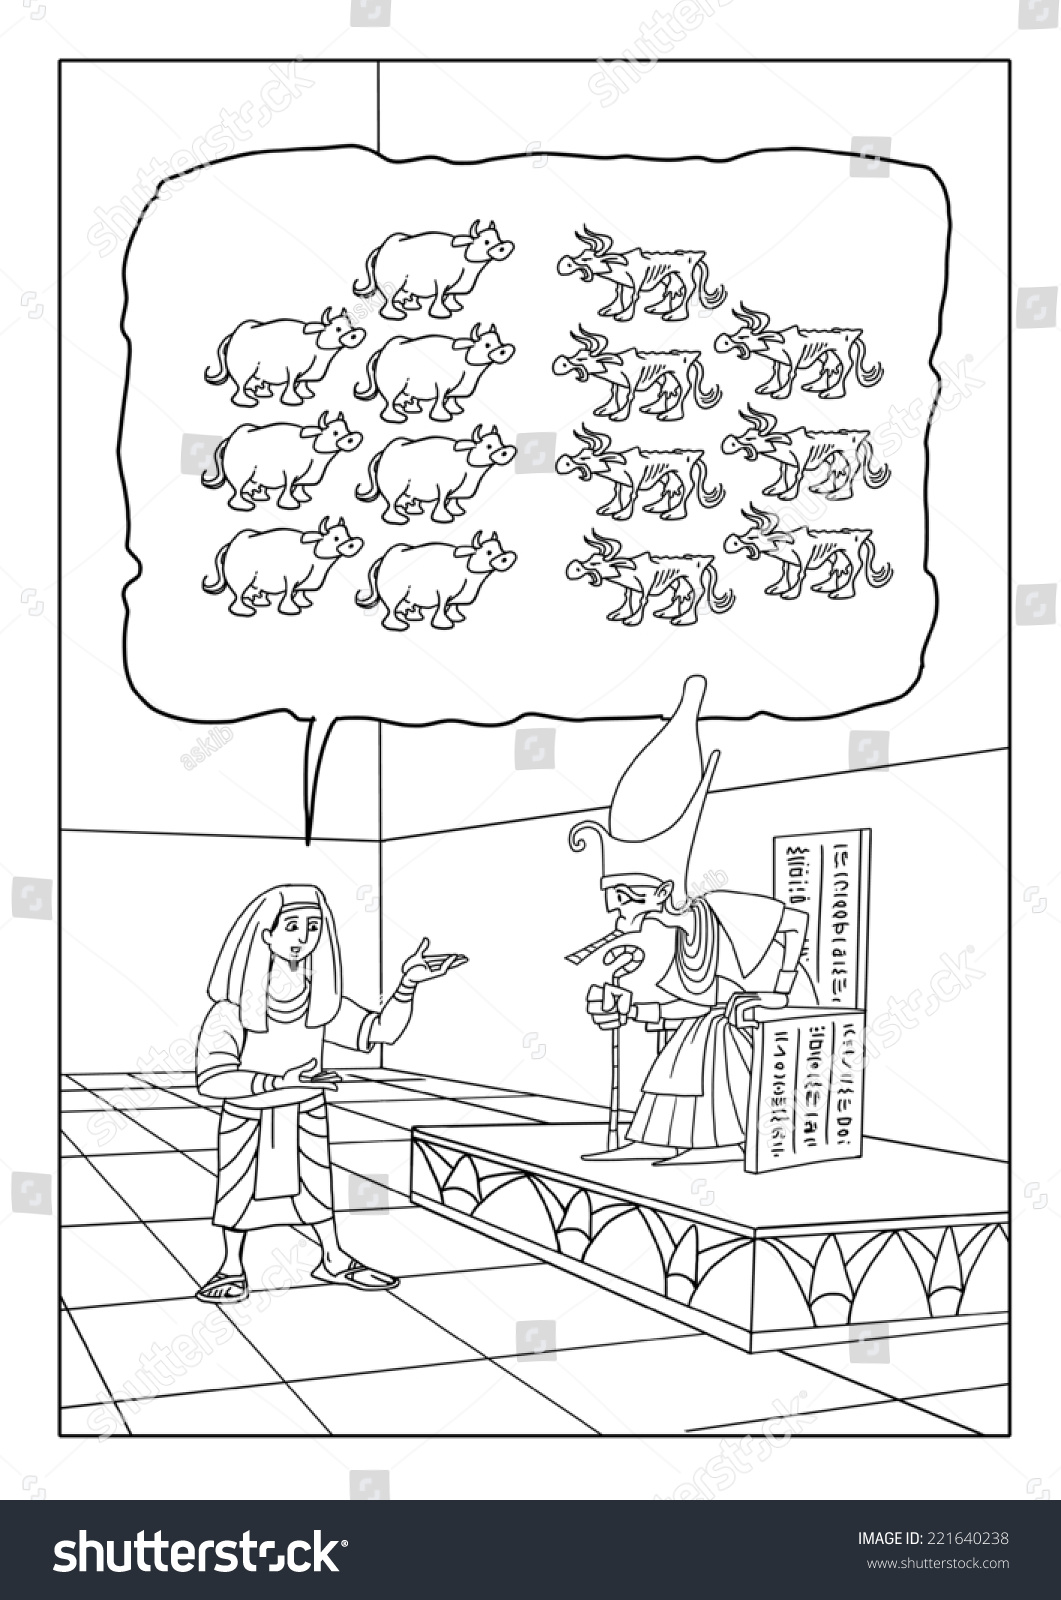 joseph pharaohs dreams coloring pages - photo#10